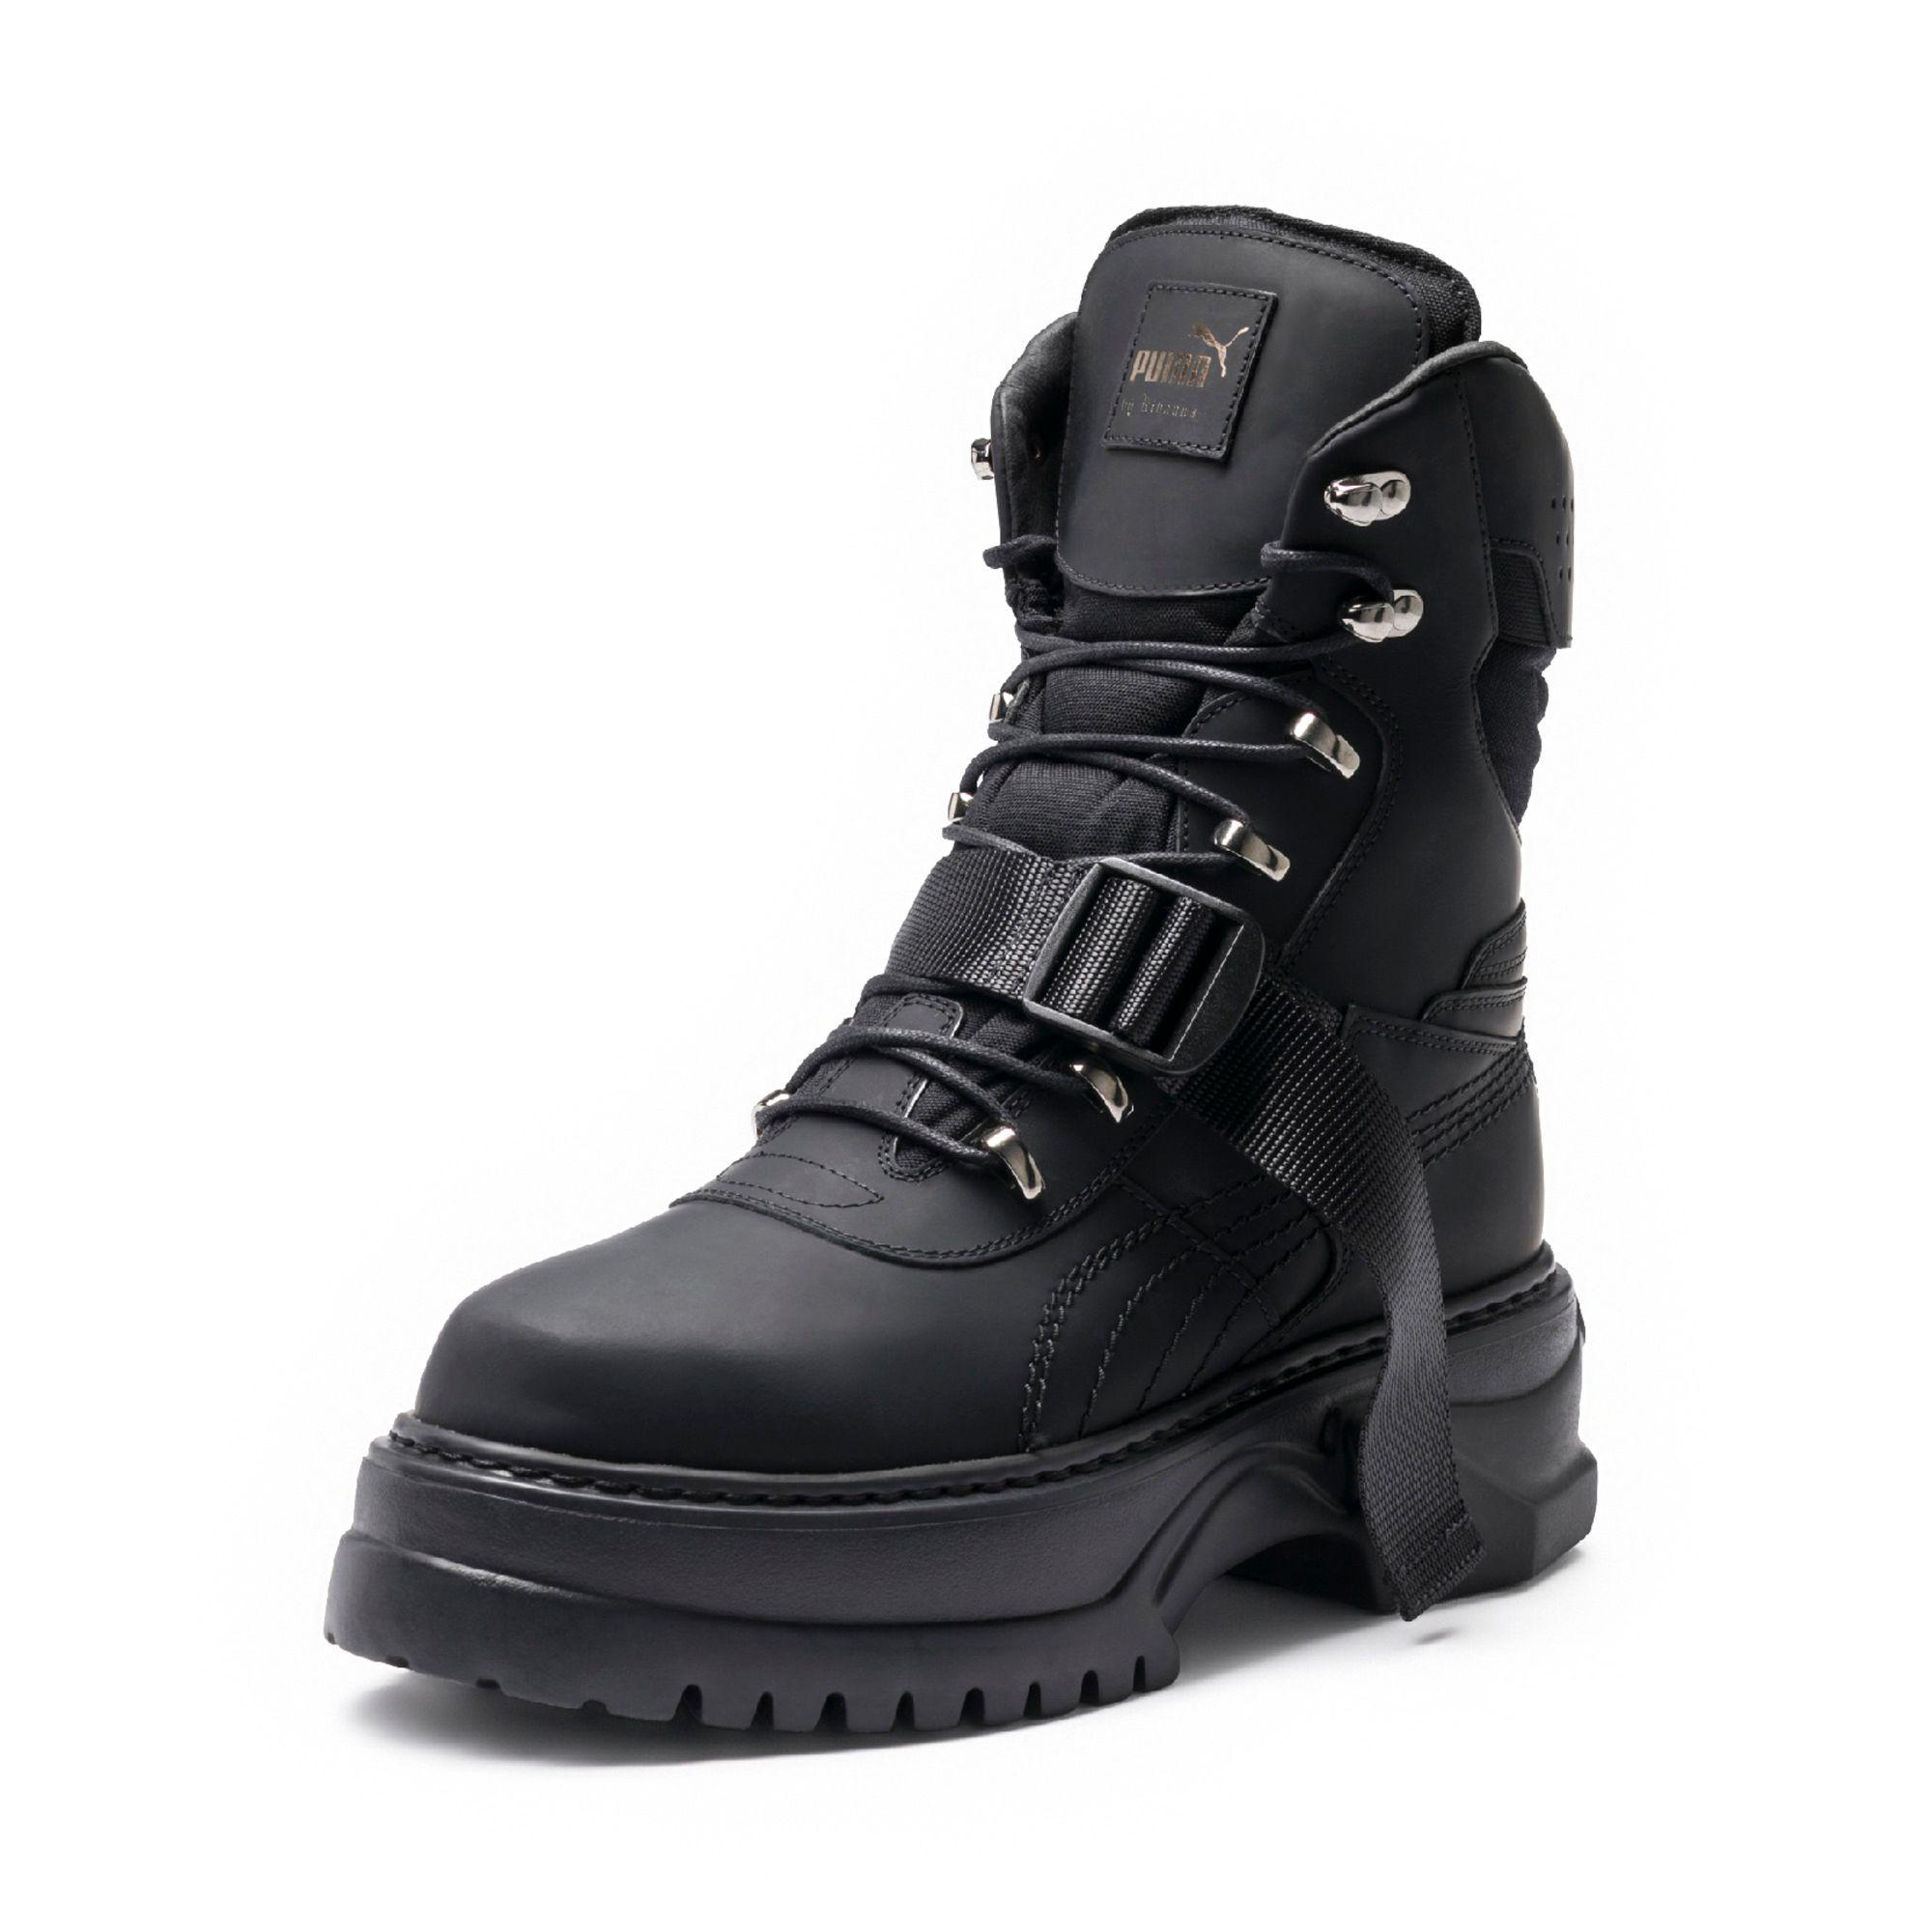 hot sale online 2b6c6 a6faf Black Fenty Men's Winter Boot Nubuck